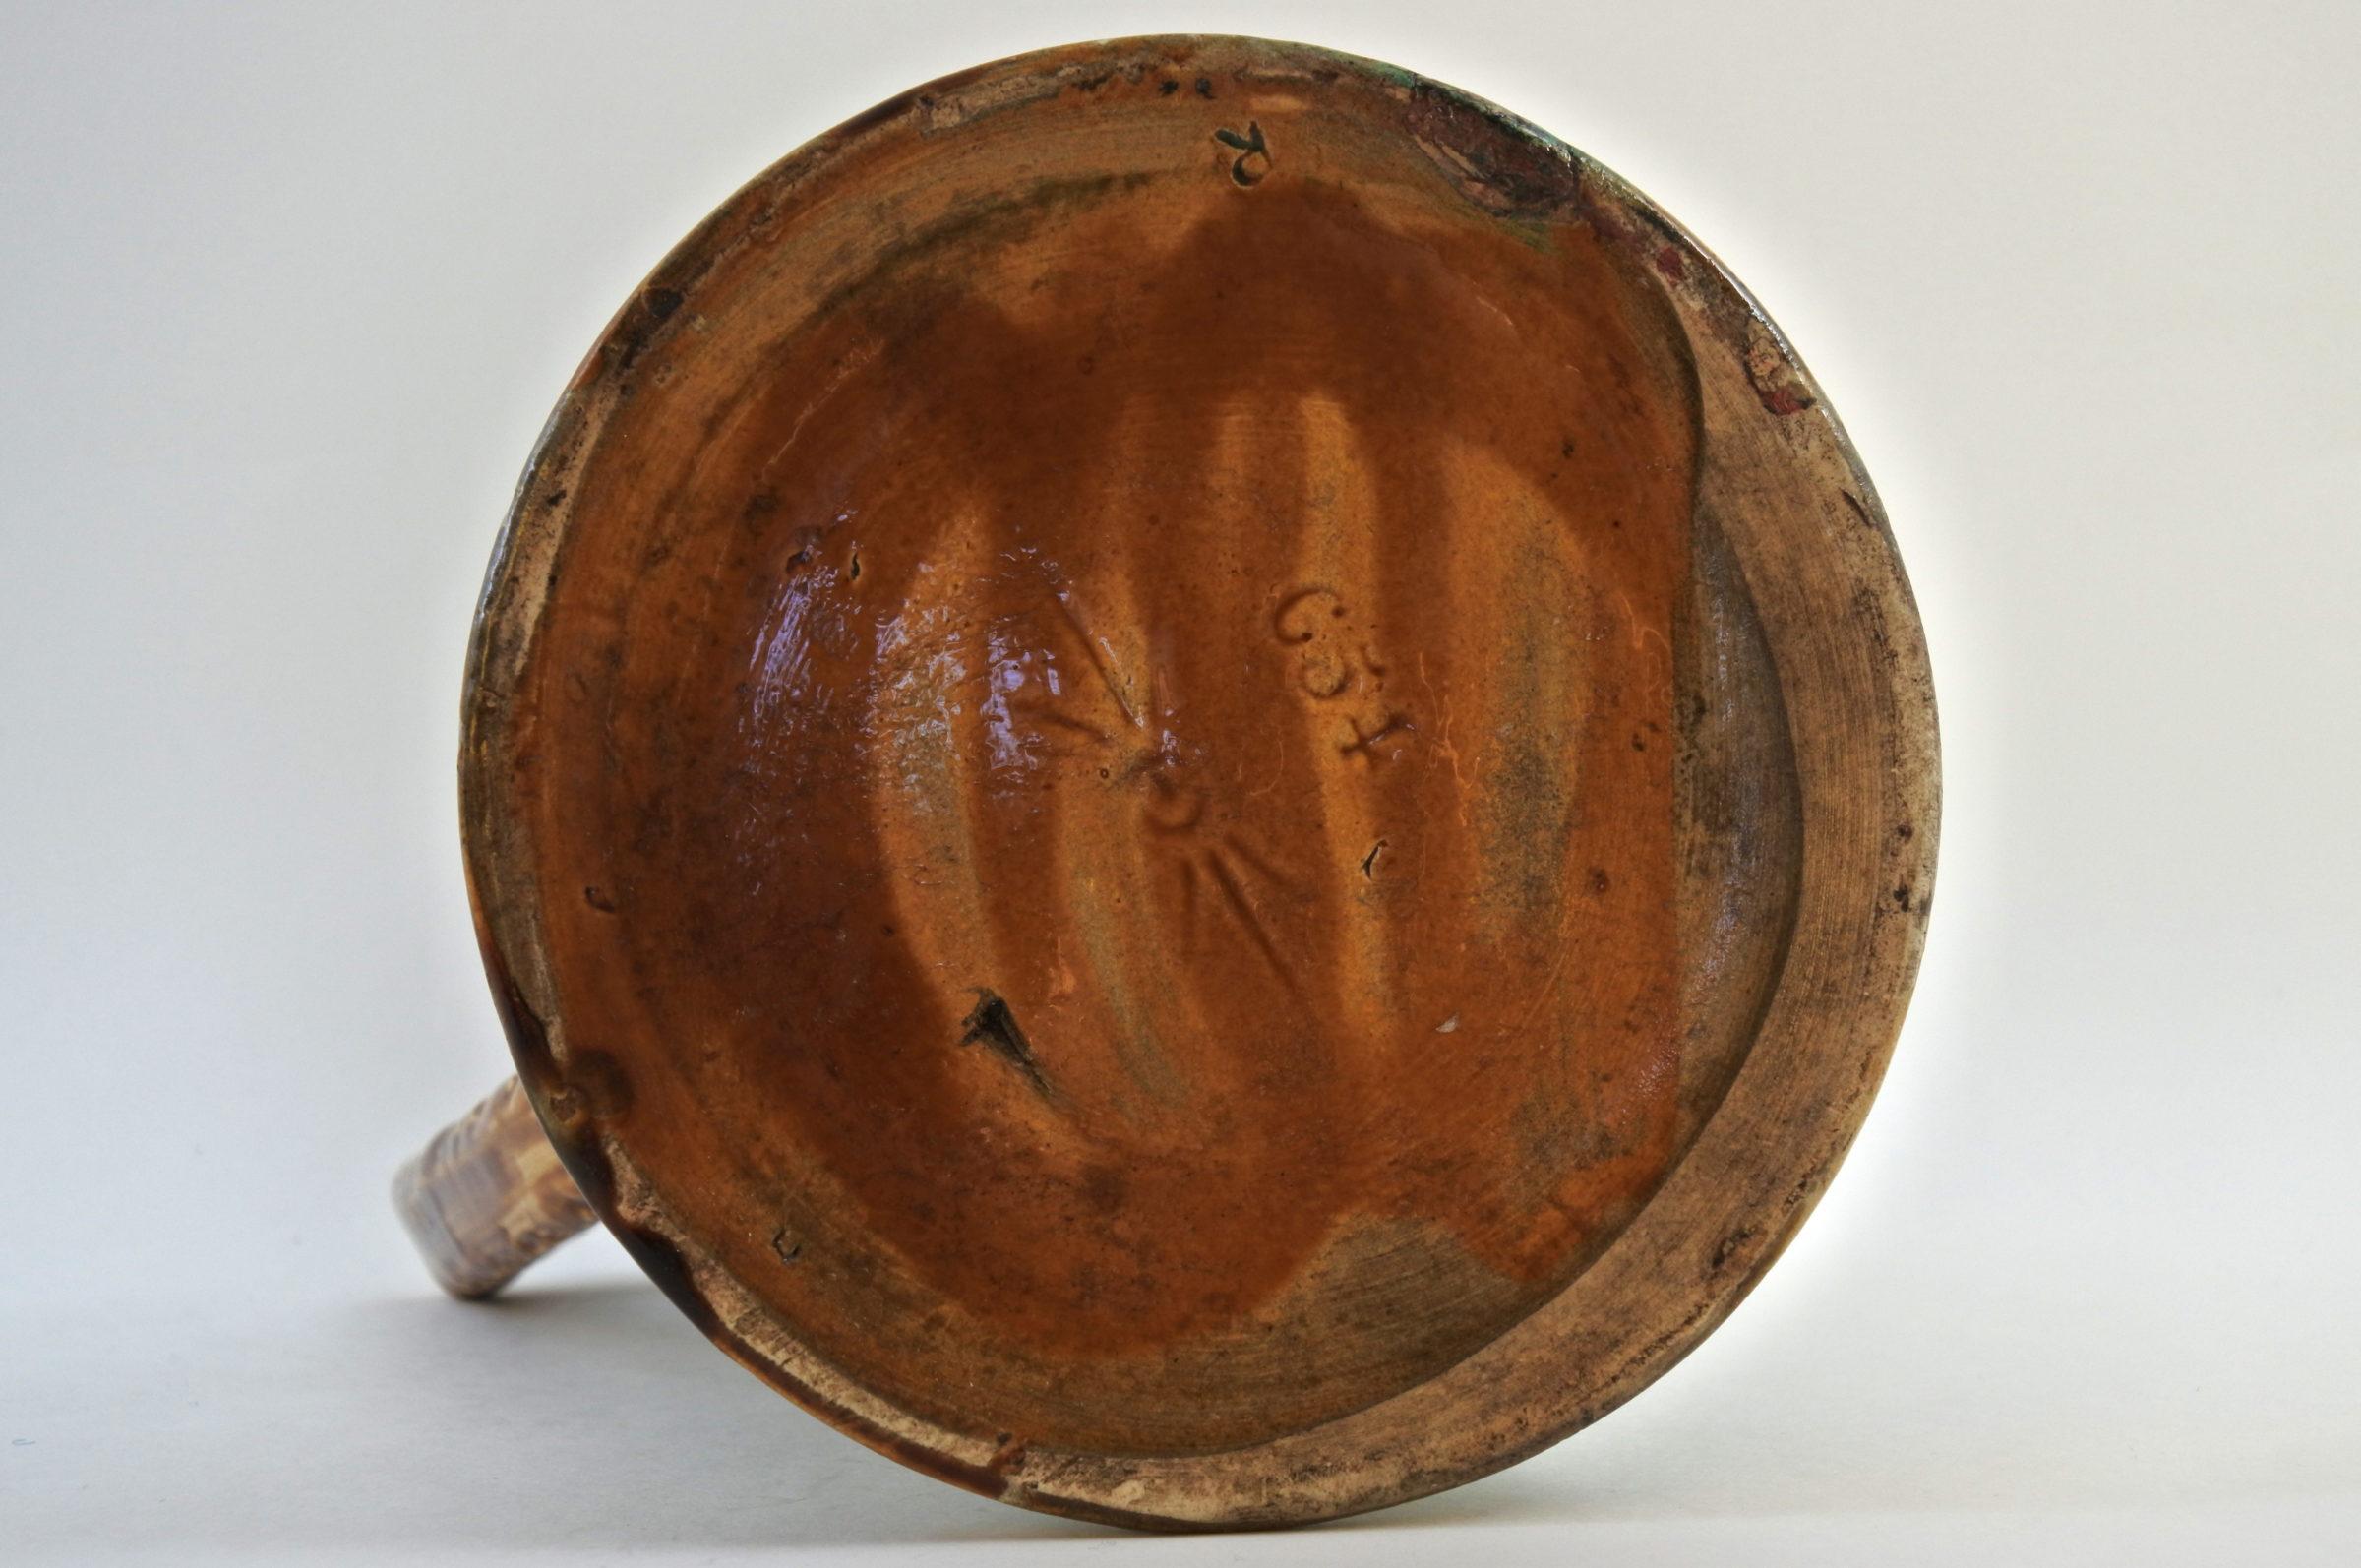 Brocca in ceramica barbotine con cardi - Chardons - 5